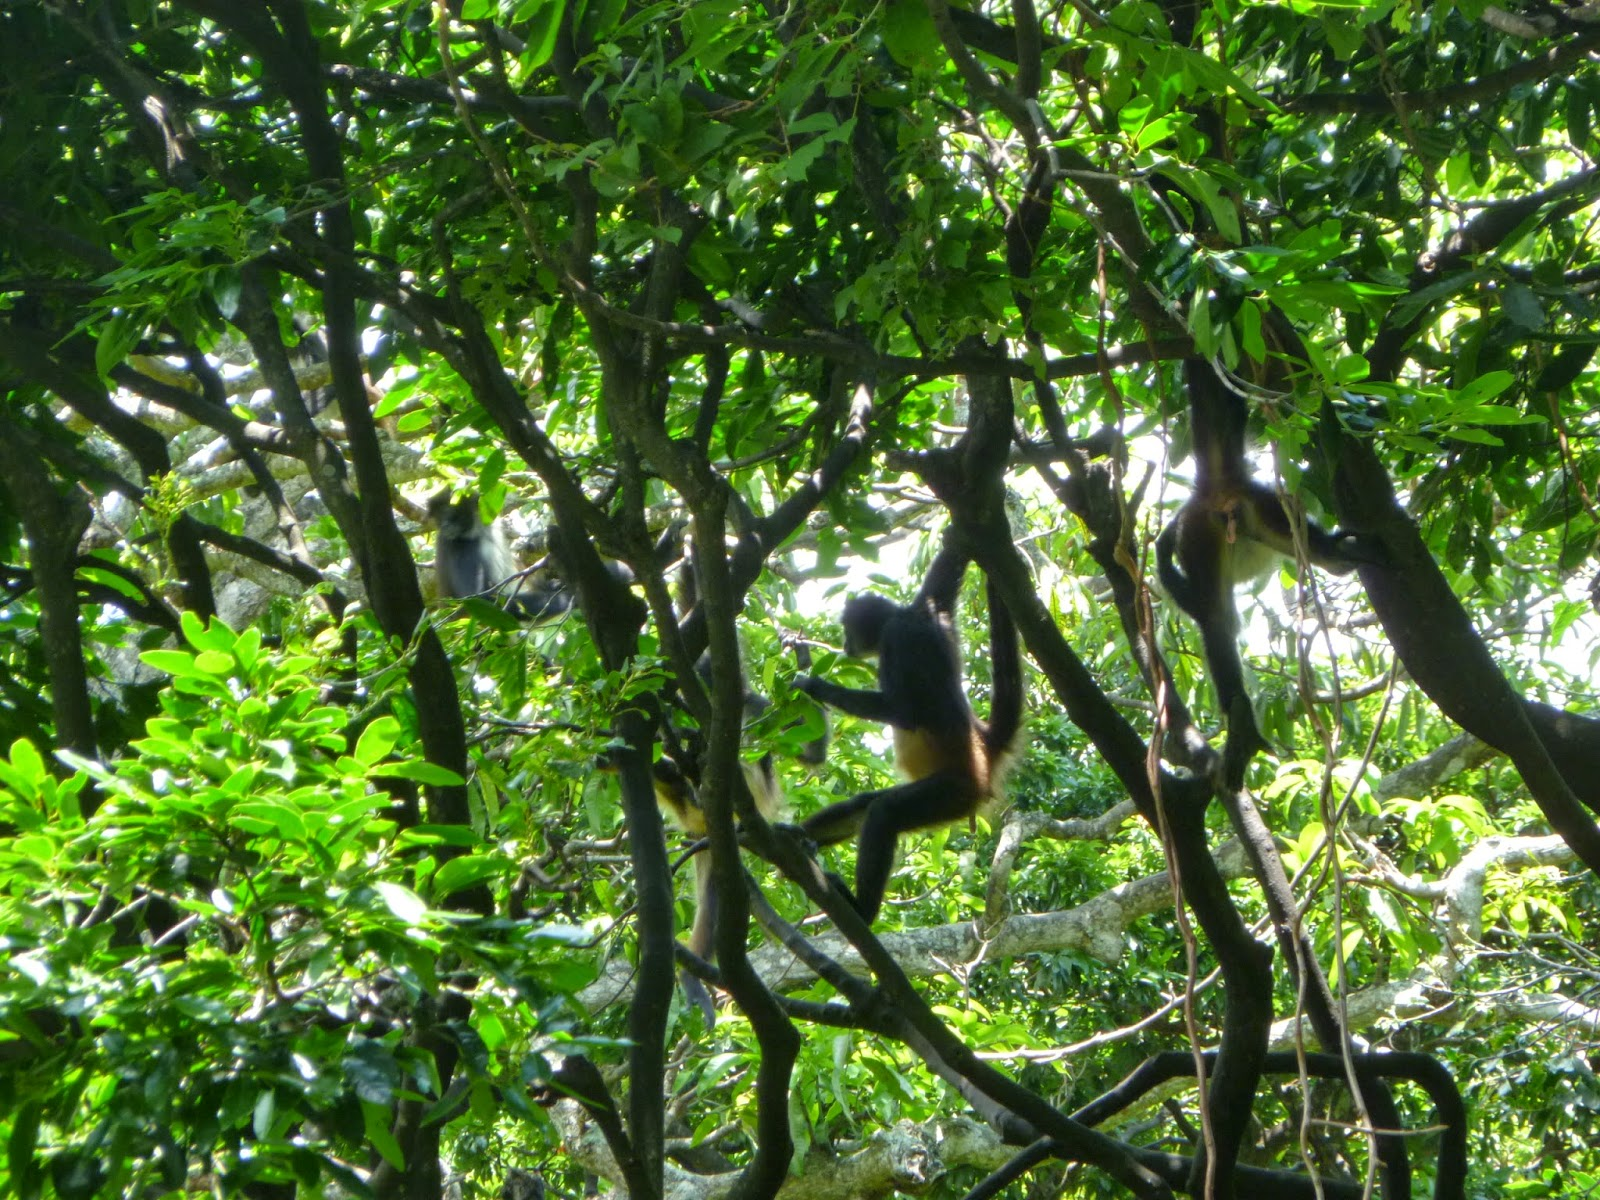 Cuida el Bosque del Zoomat